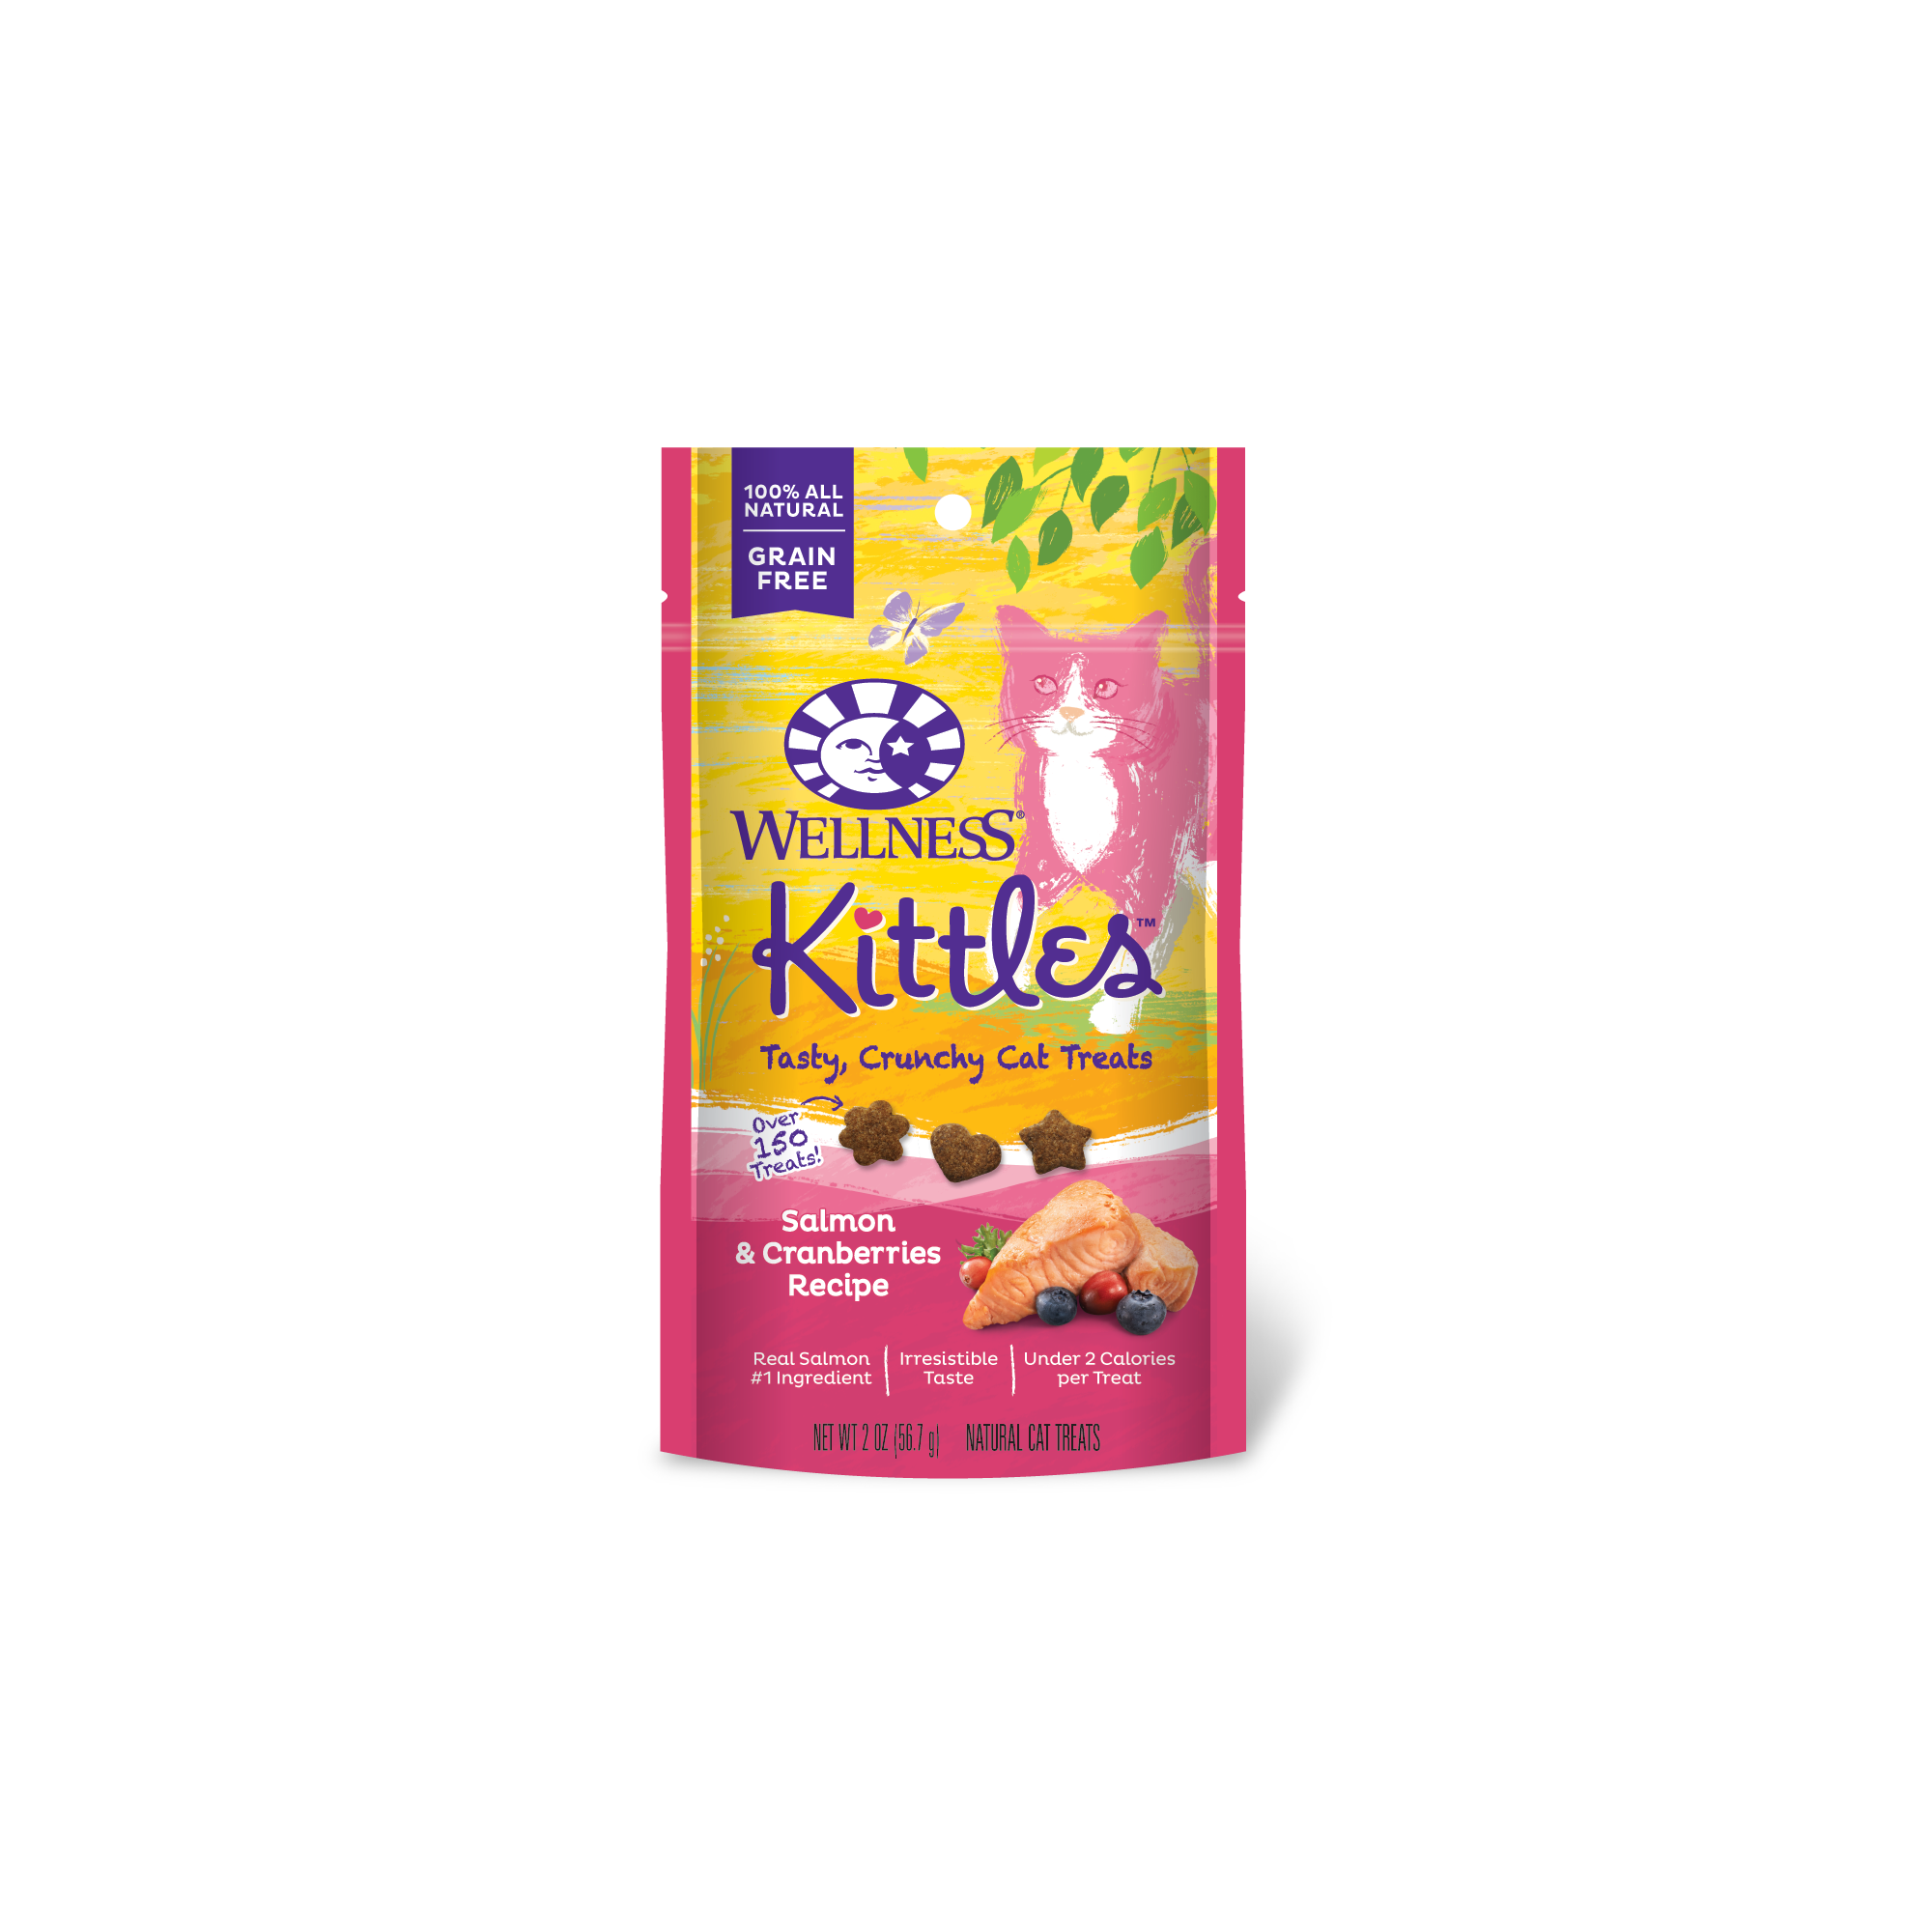 Wellness Kittles Grain-Free Salmon & Cranberries Crunchy Cat Treats, Wet Cat Food, 6-oz